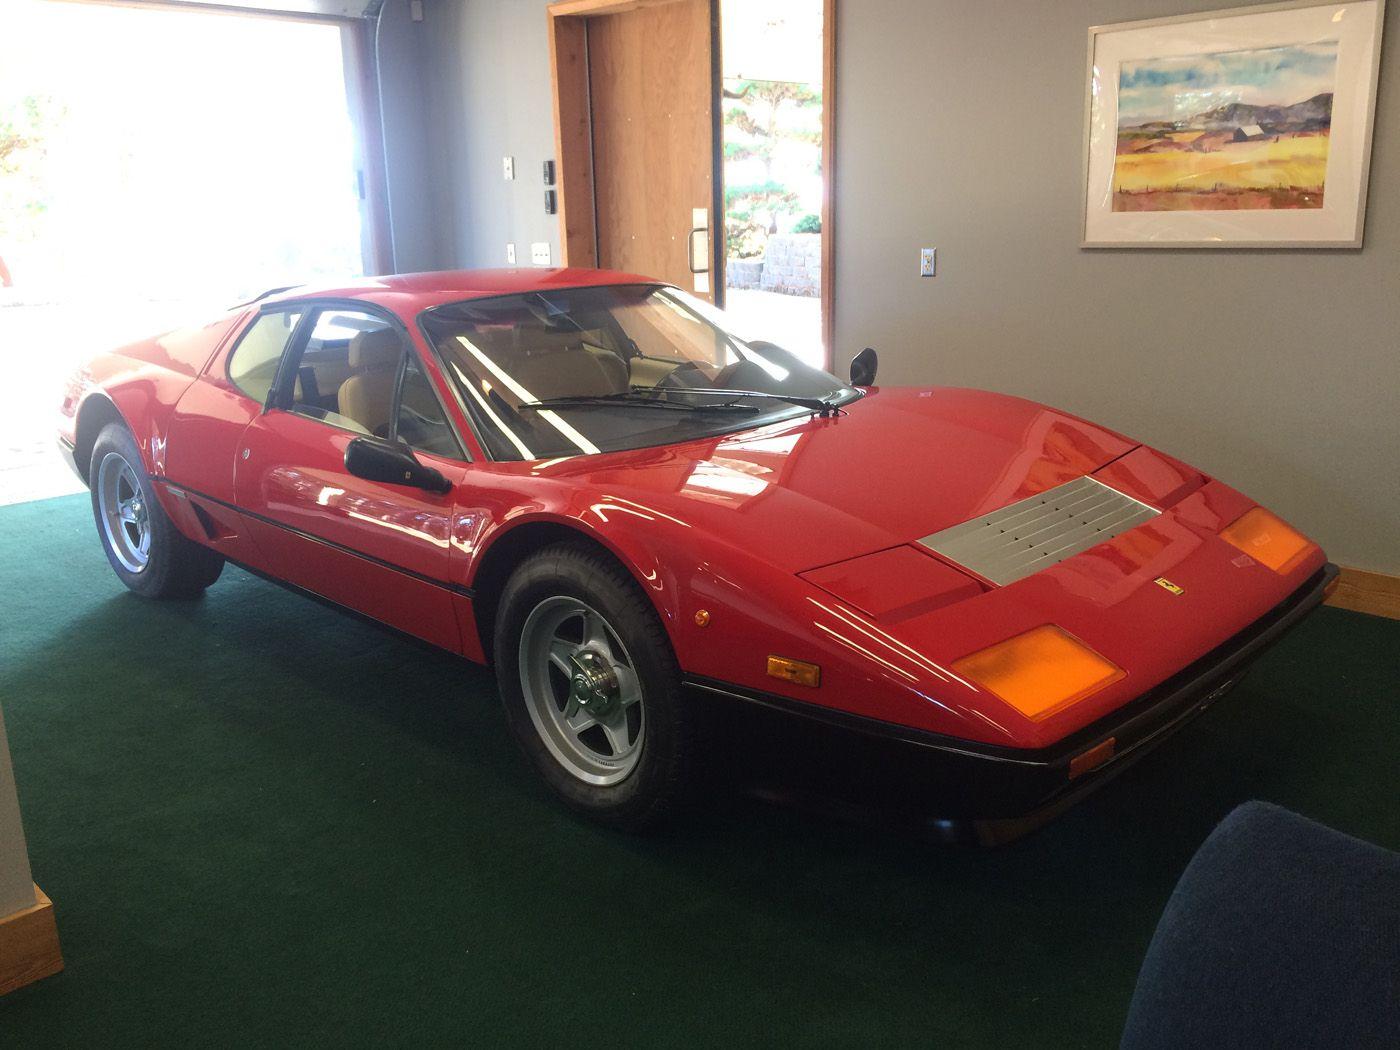 "<img src=""1984-ferrari.jpg"" alt=""A 1984 Ferrari 512 BBi ready for bids"">"